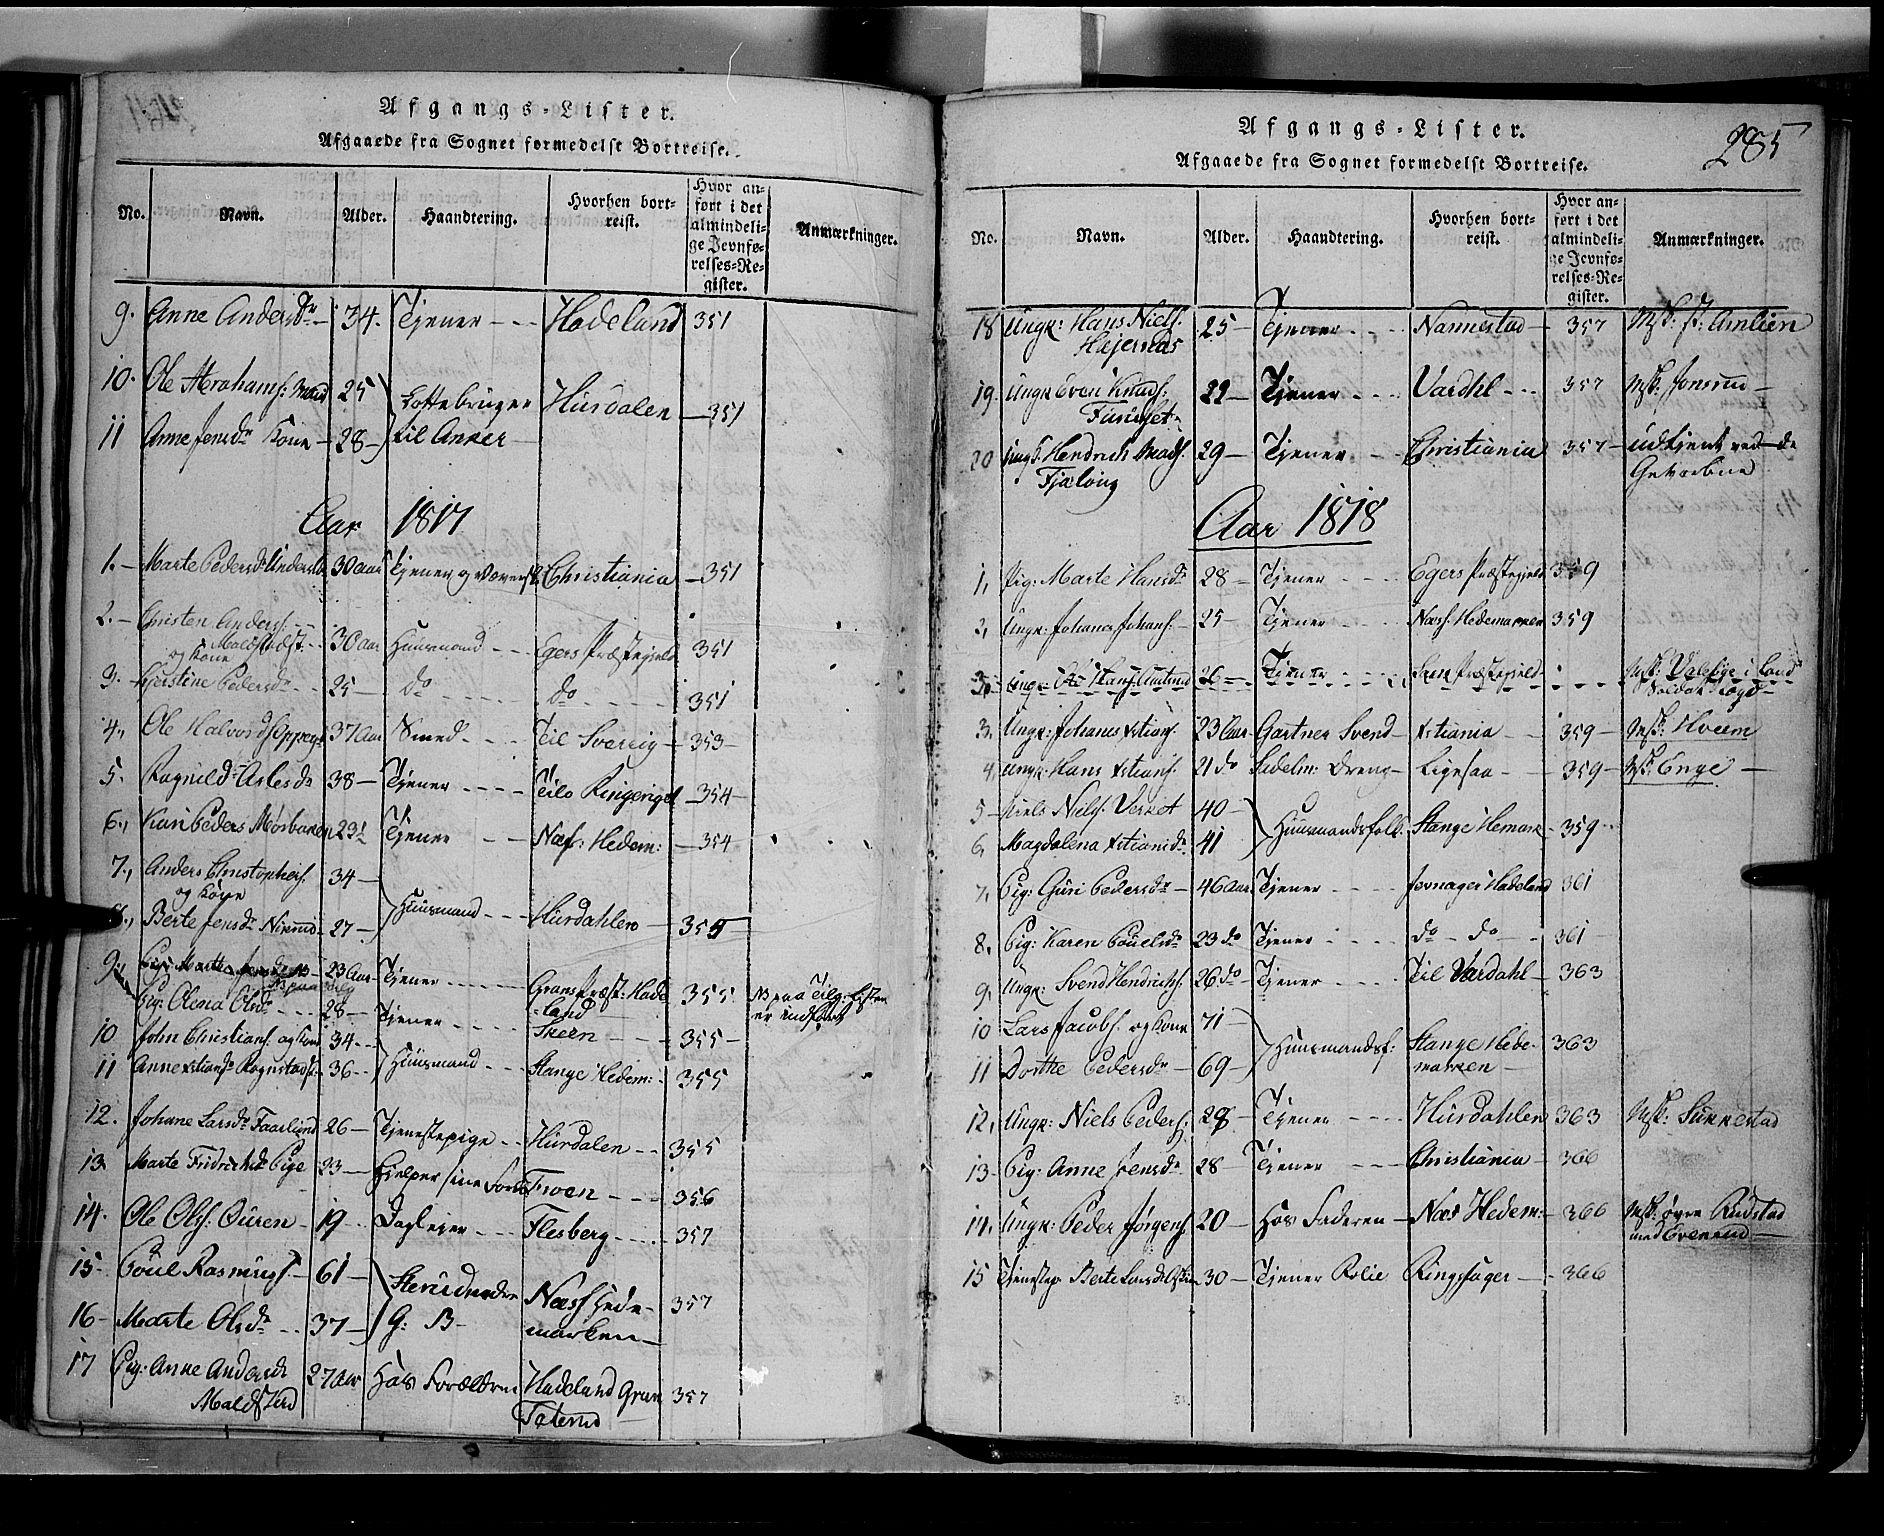 SAH, Toten prestekontor, Klokkerbok nr. 1, 1814-1820, s. 285